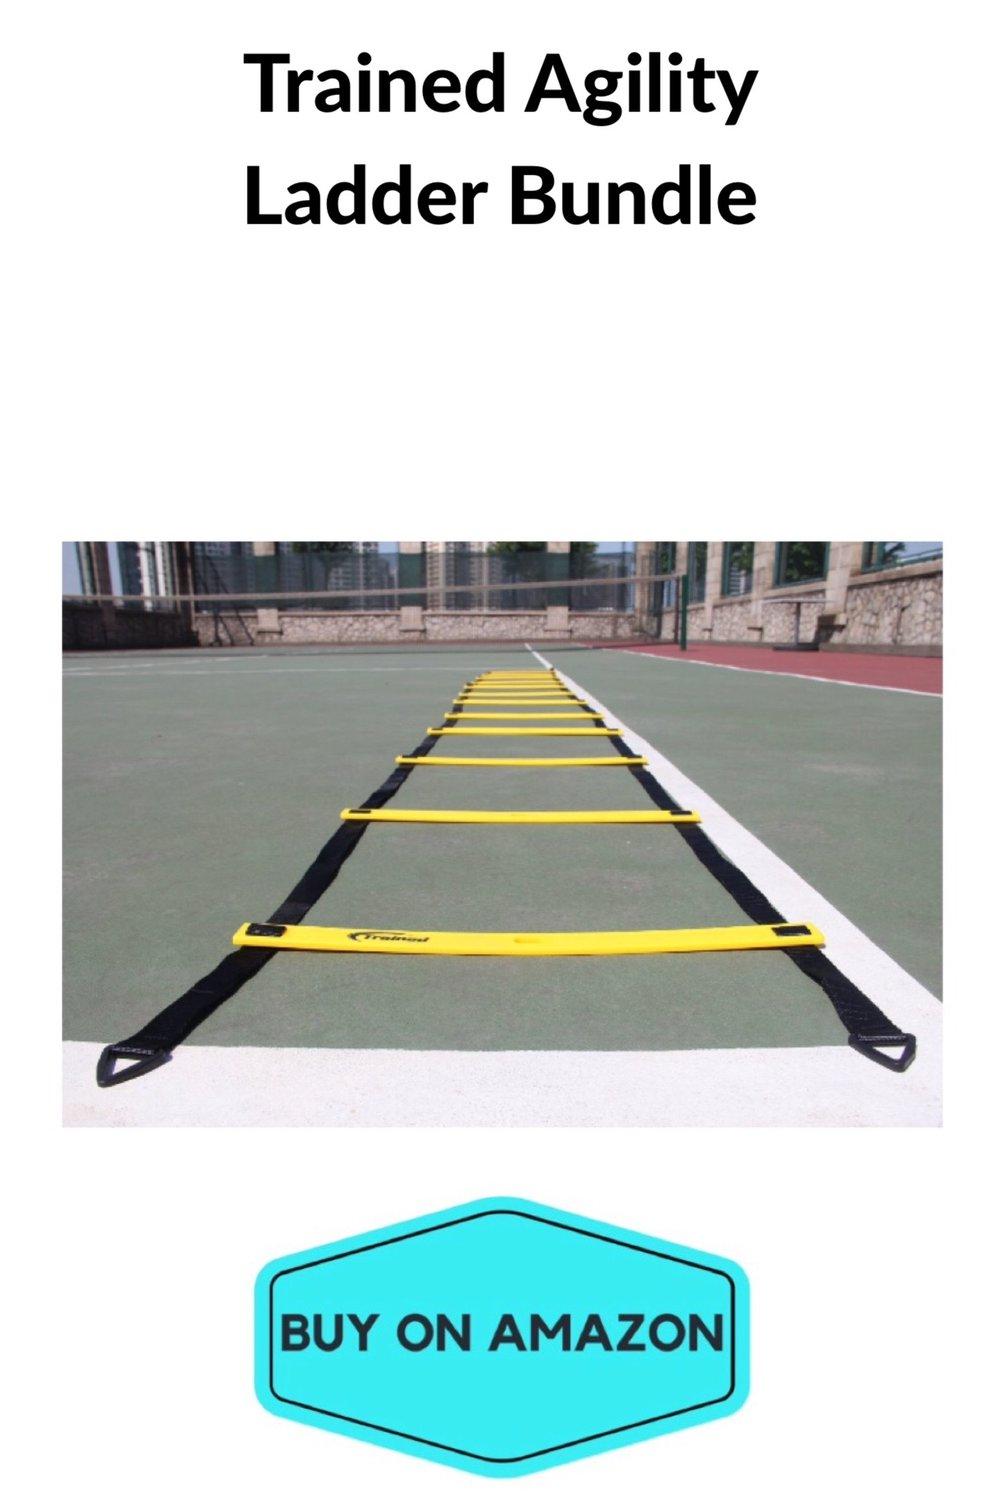 Training Agility Ladder Bundle